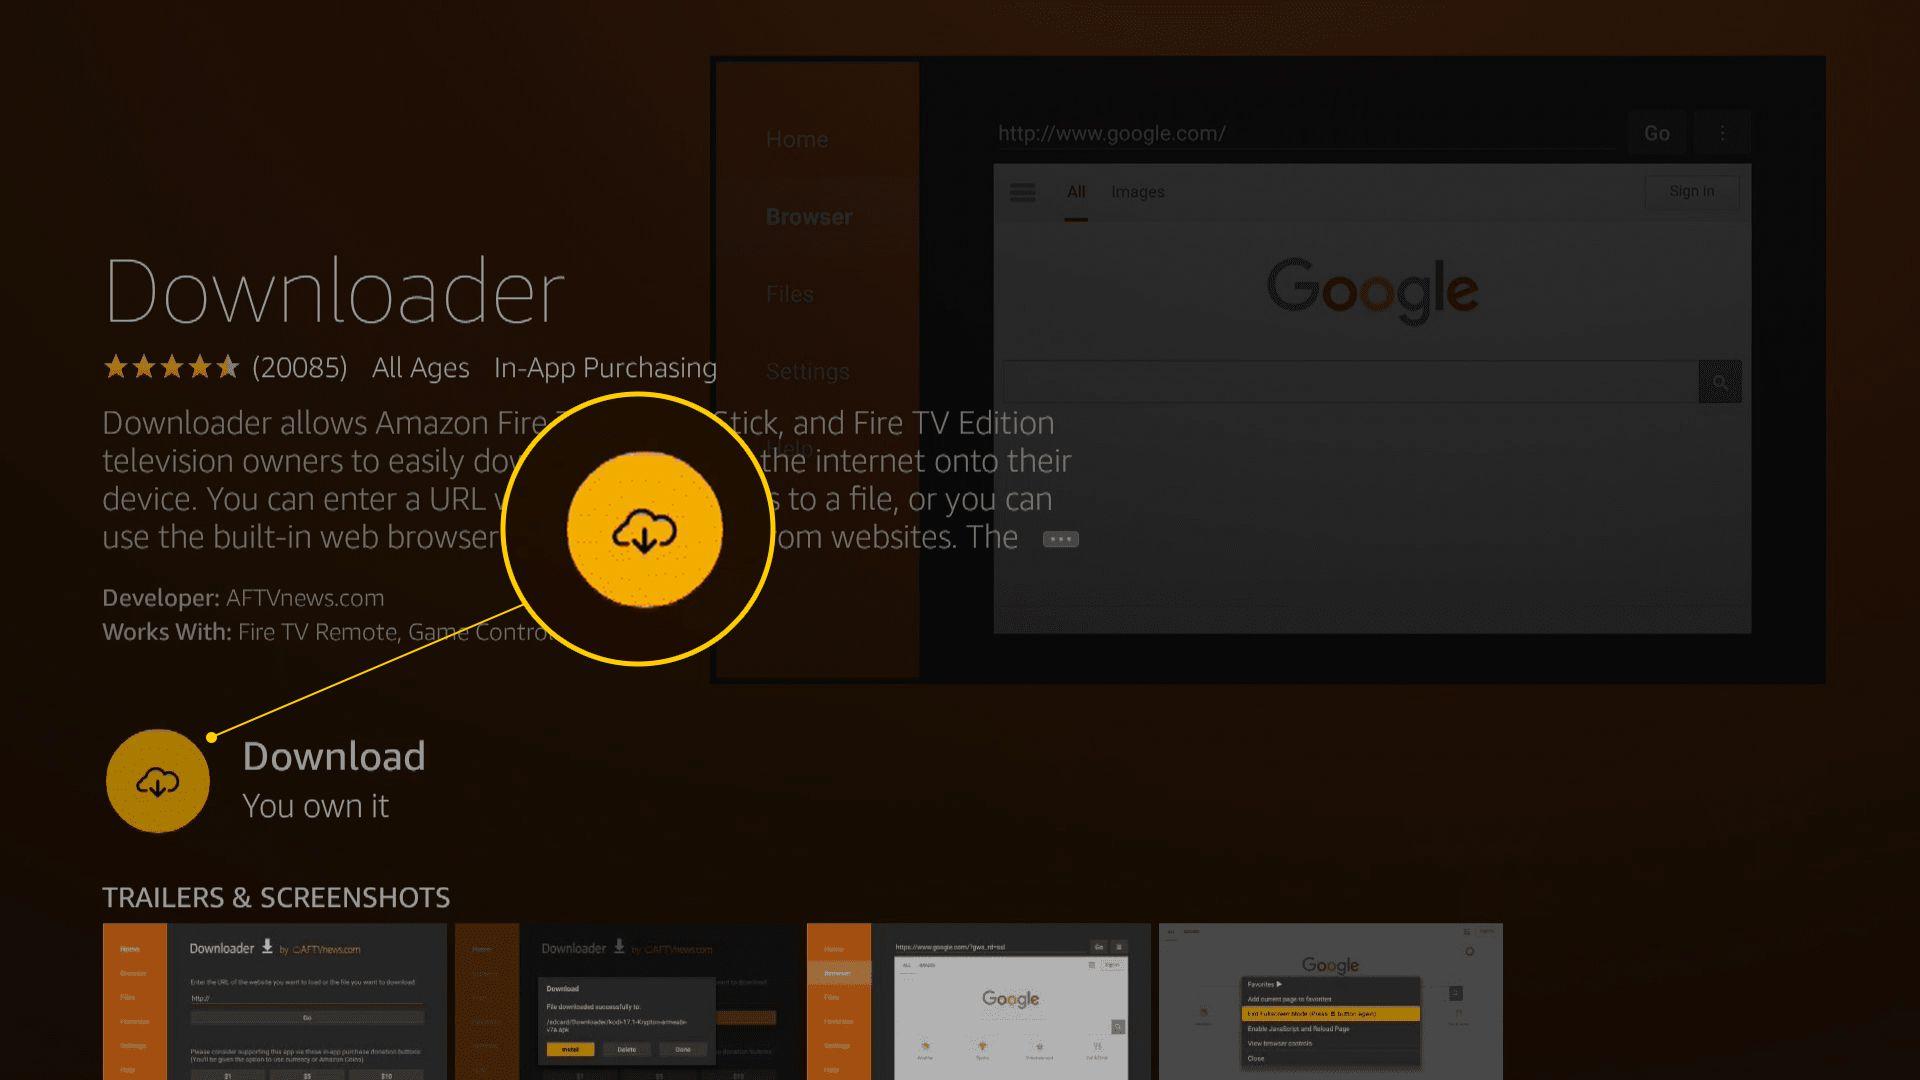 Download button for Downloader app